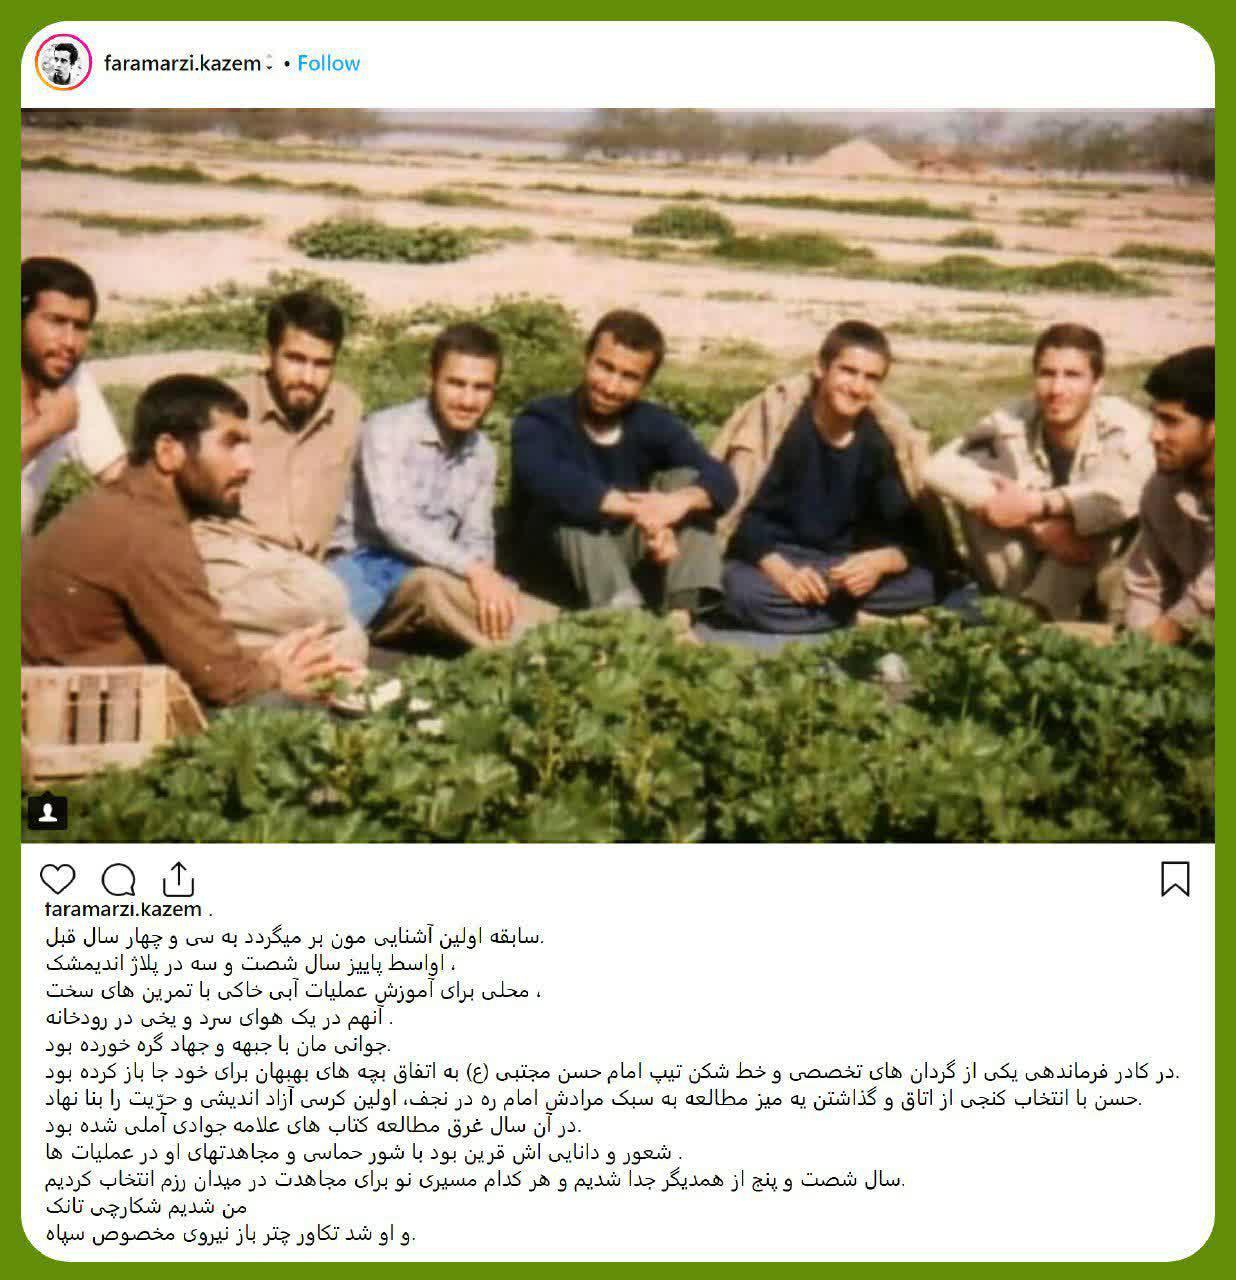 photo 2018 10 23 12 36 46 پست اینستاگرامی کاظم فرامرزی درخصوص حکم حبس استاد حسن عباسی